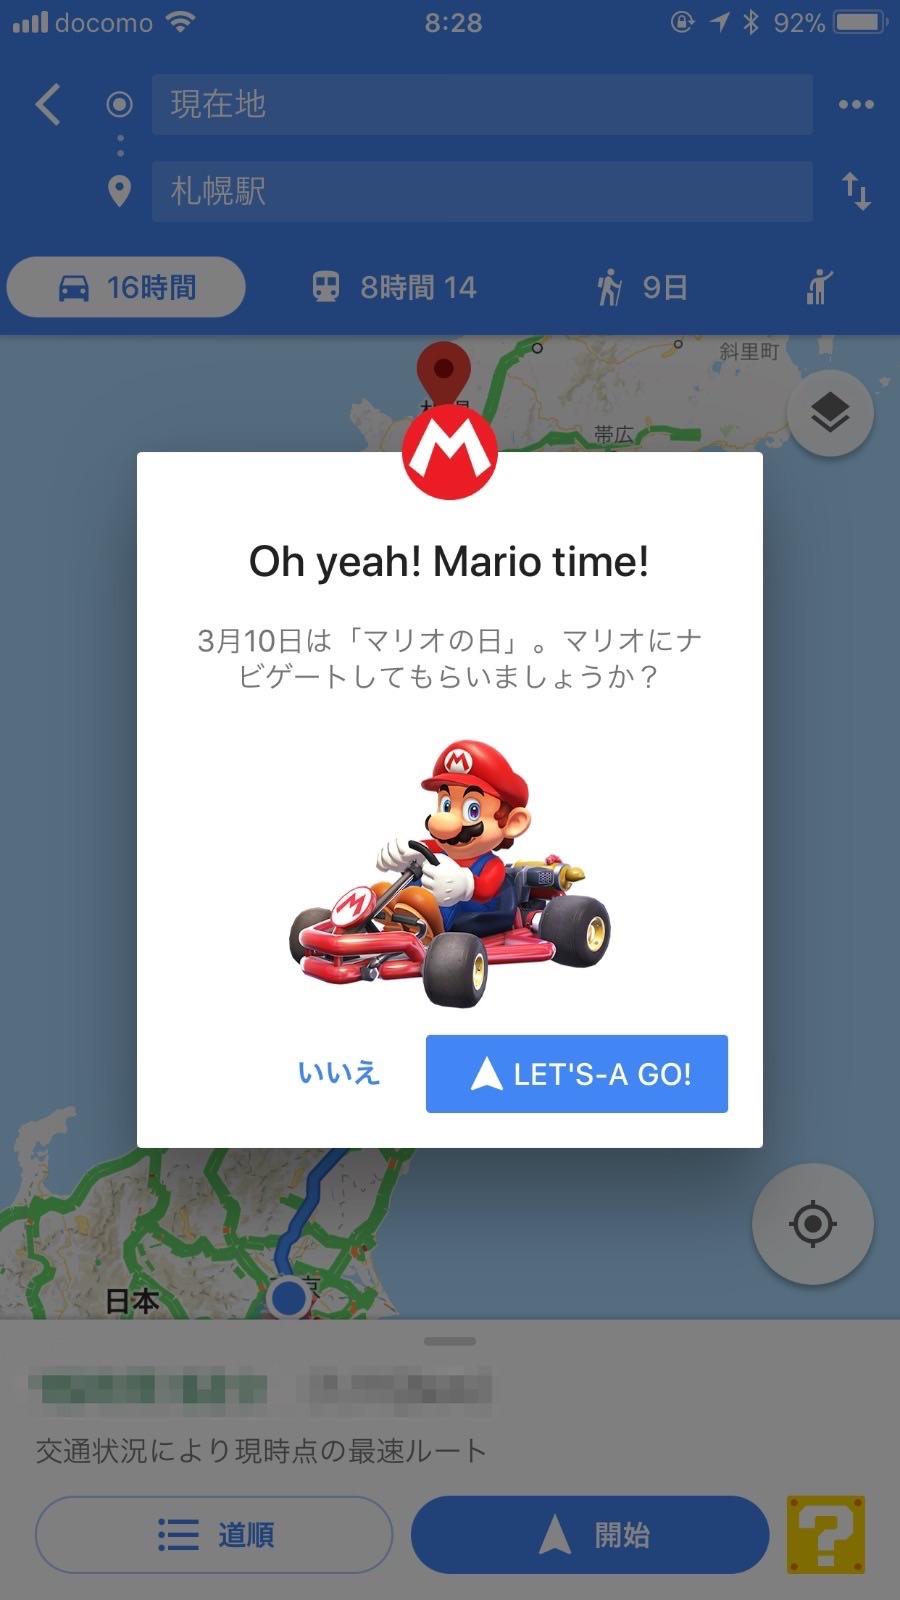 【Googleマップ】経路案内でマリオカートが登場